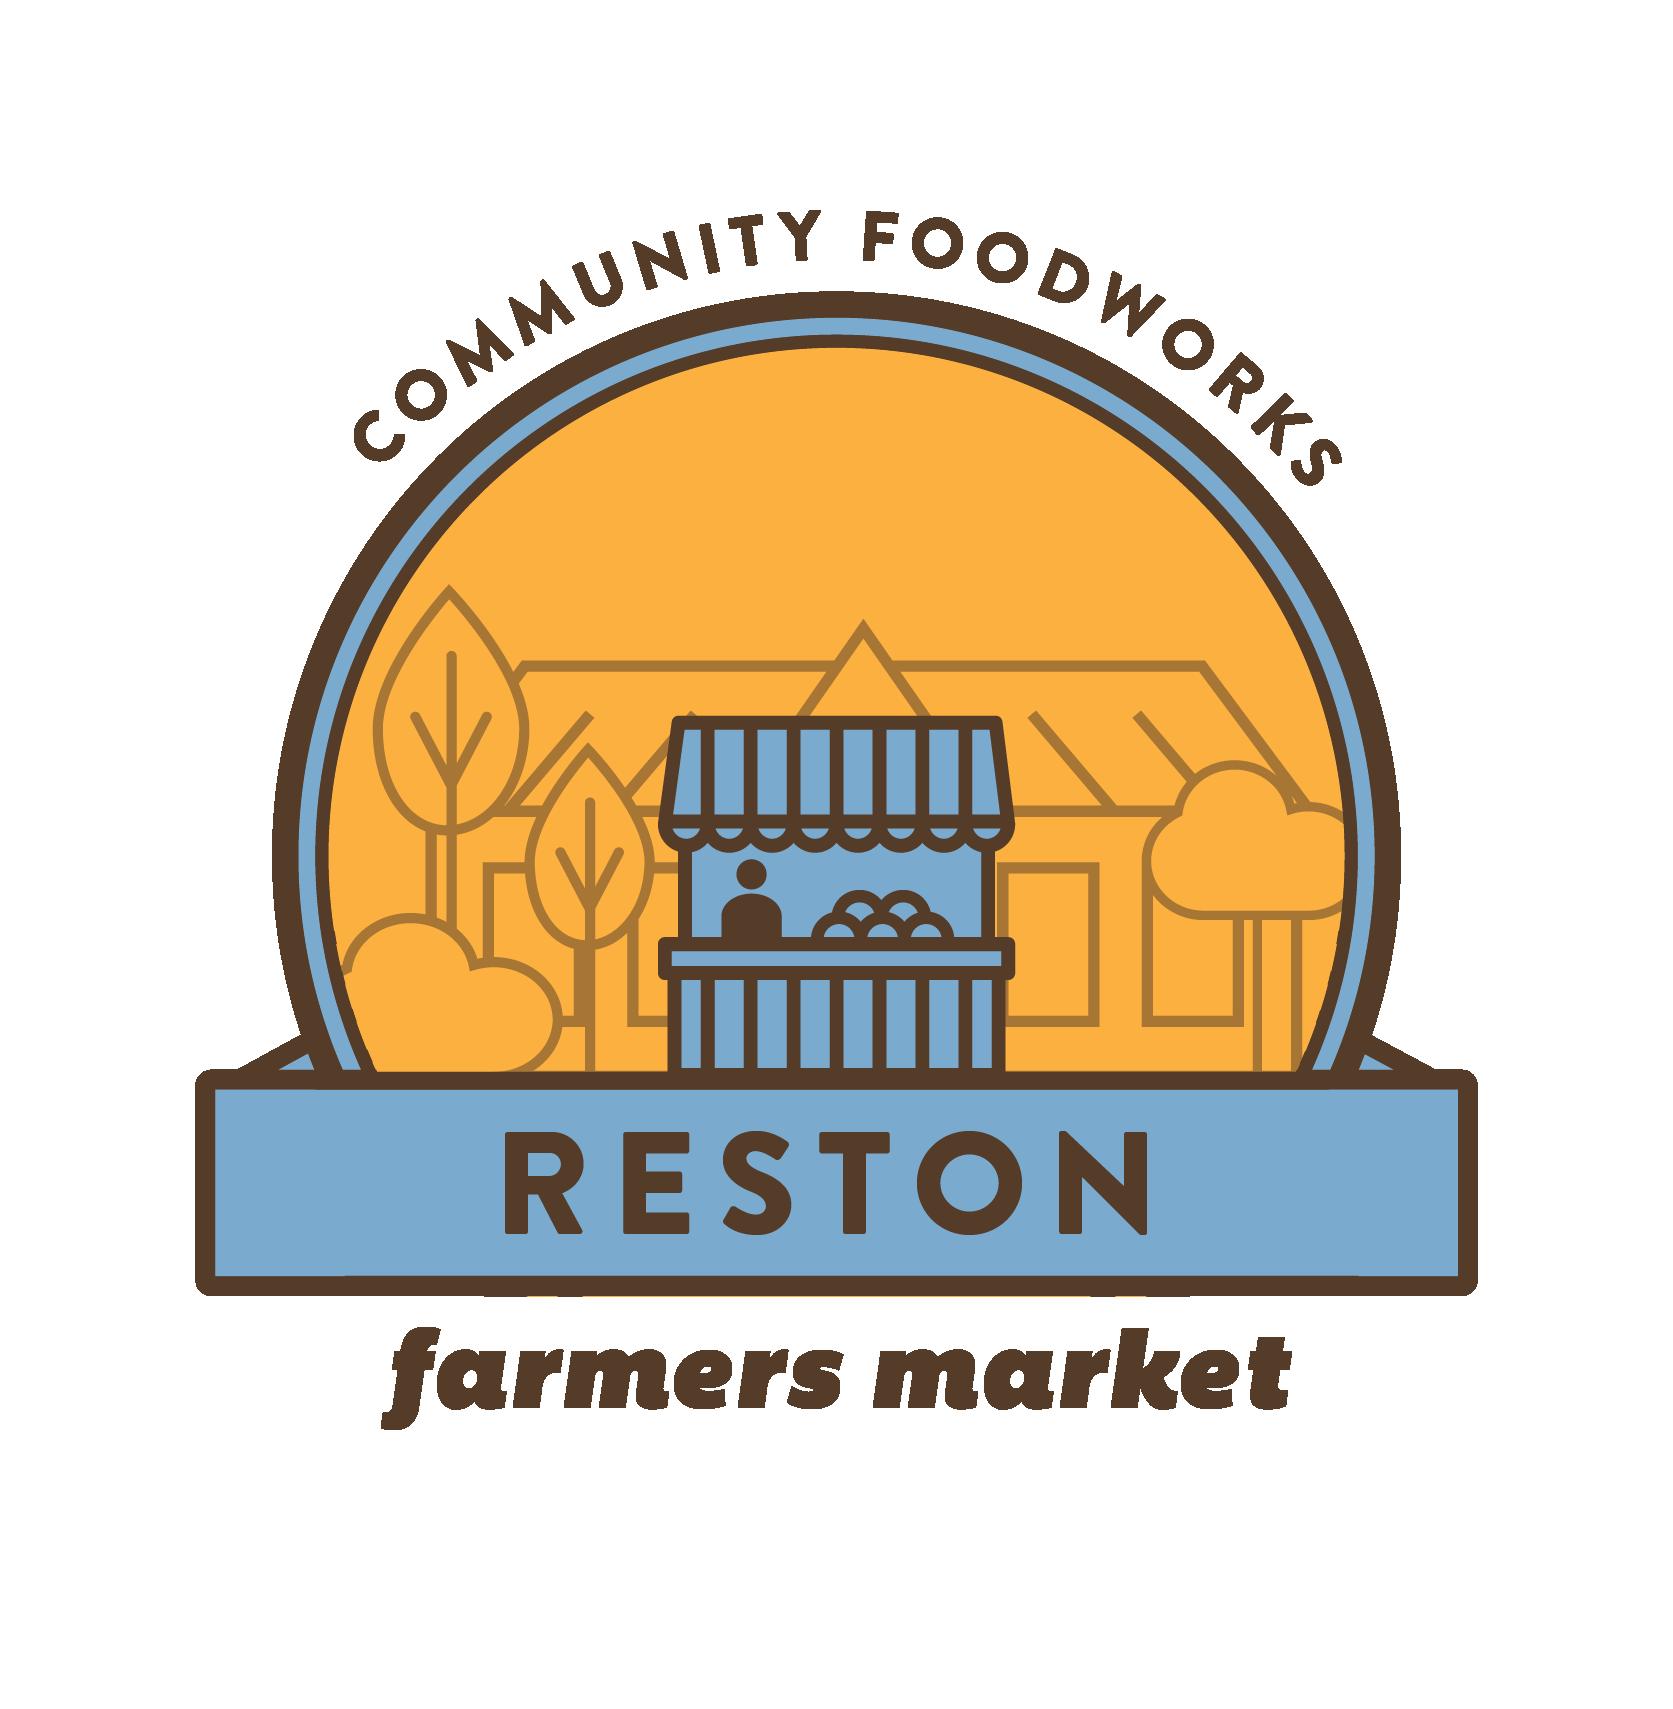 CFW_Farmers-Markets_Reston.png